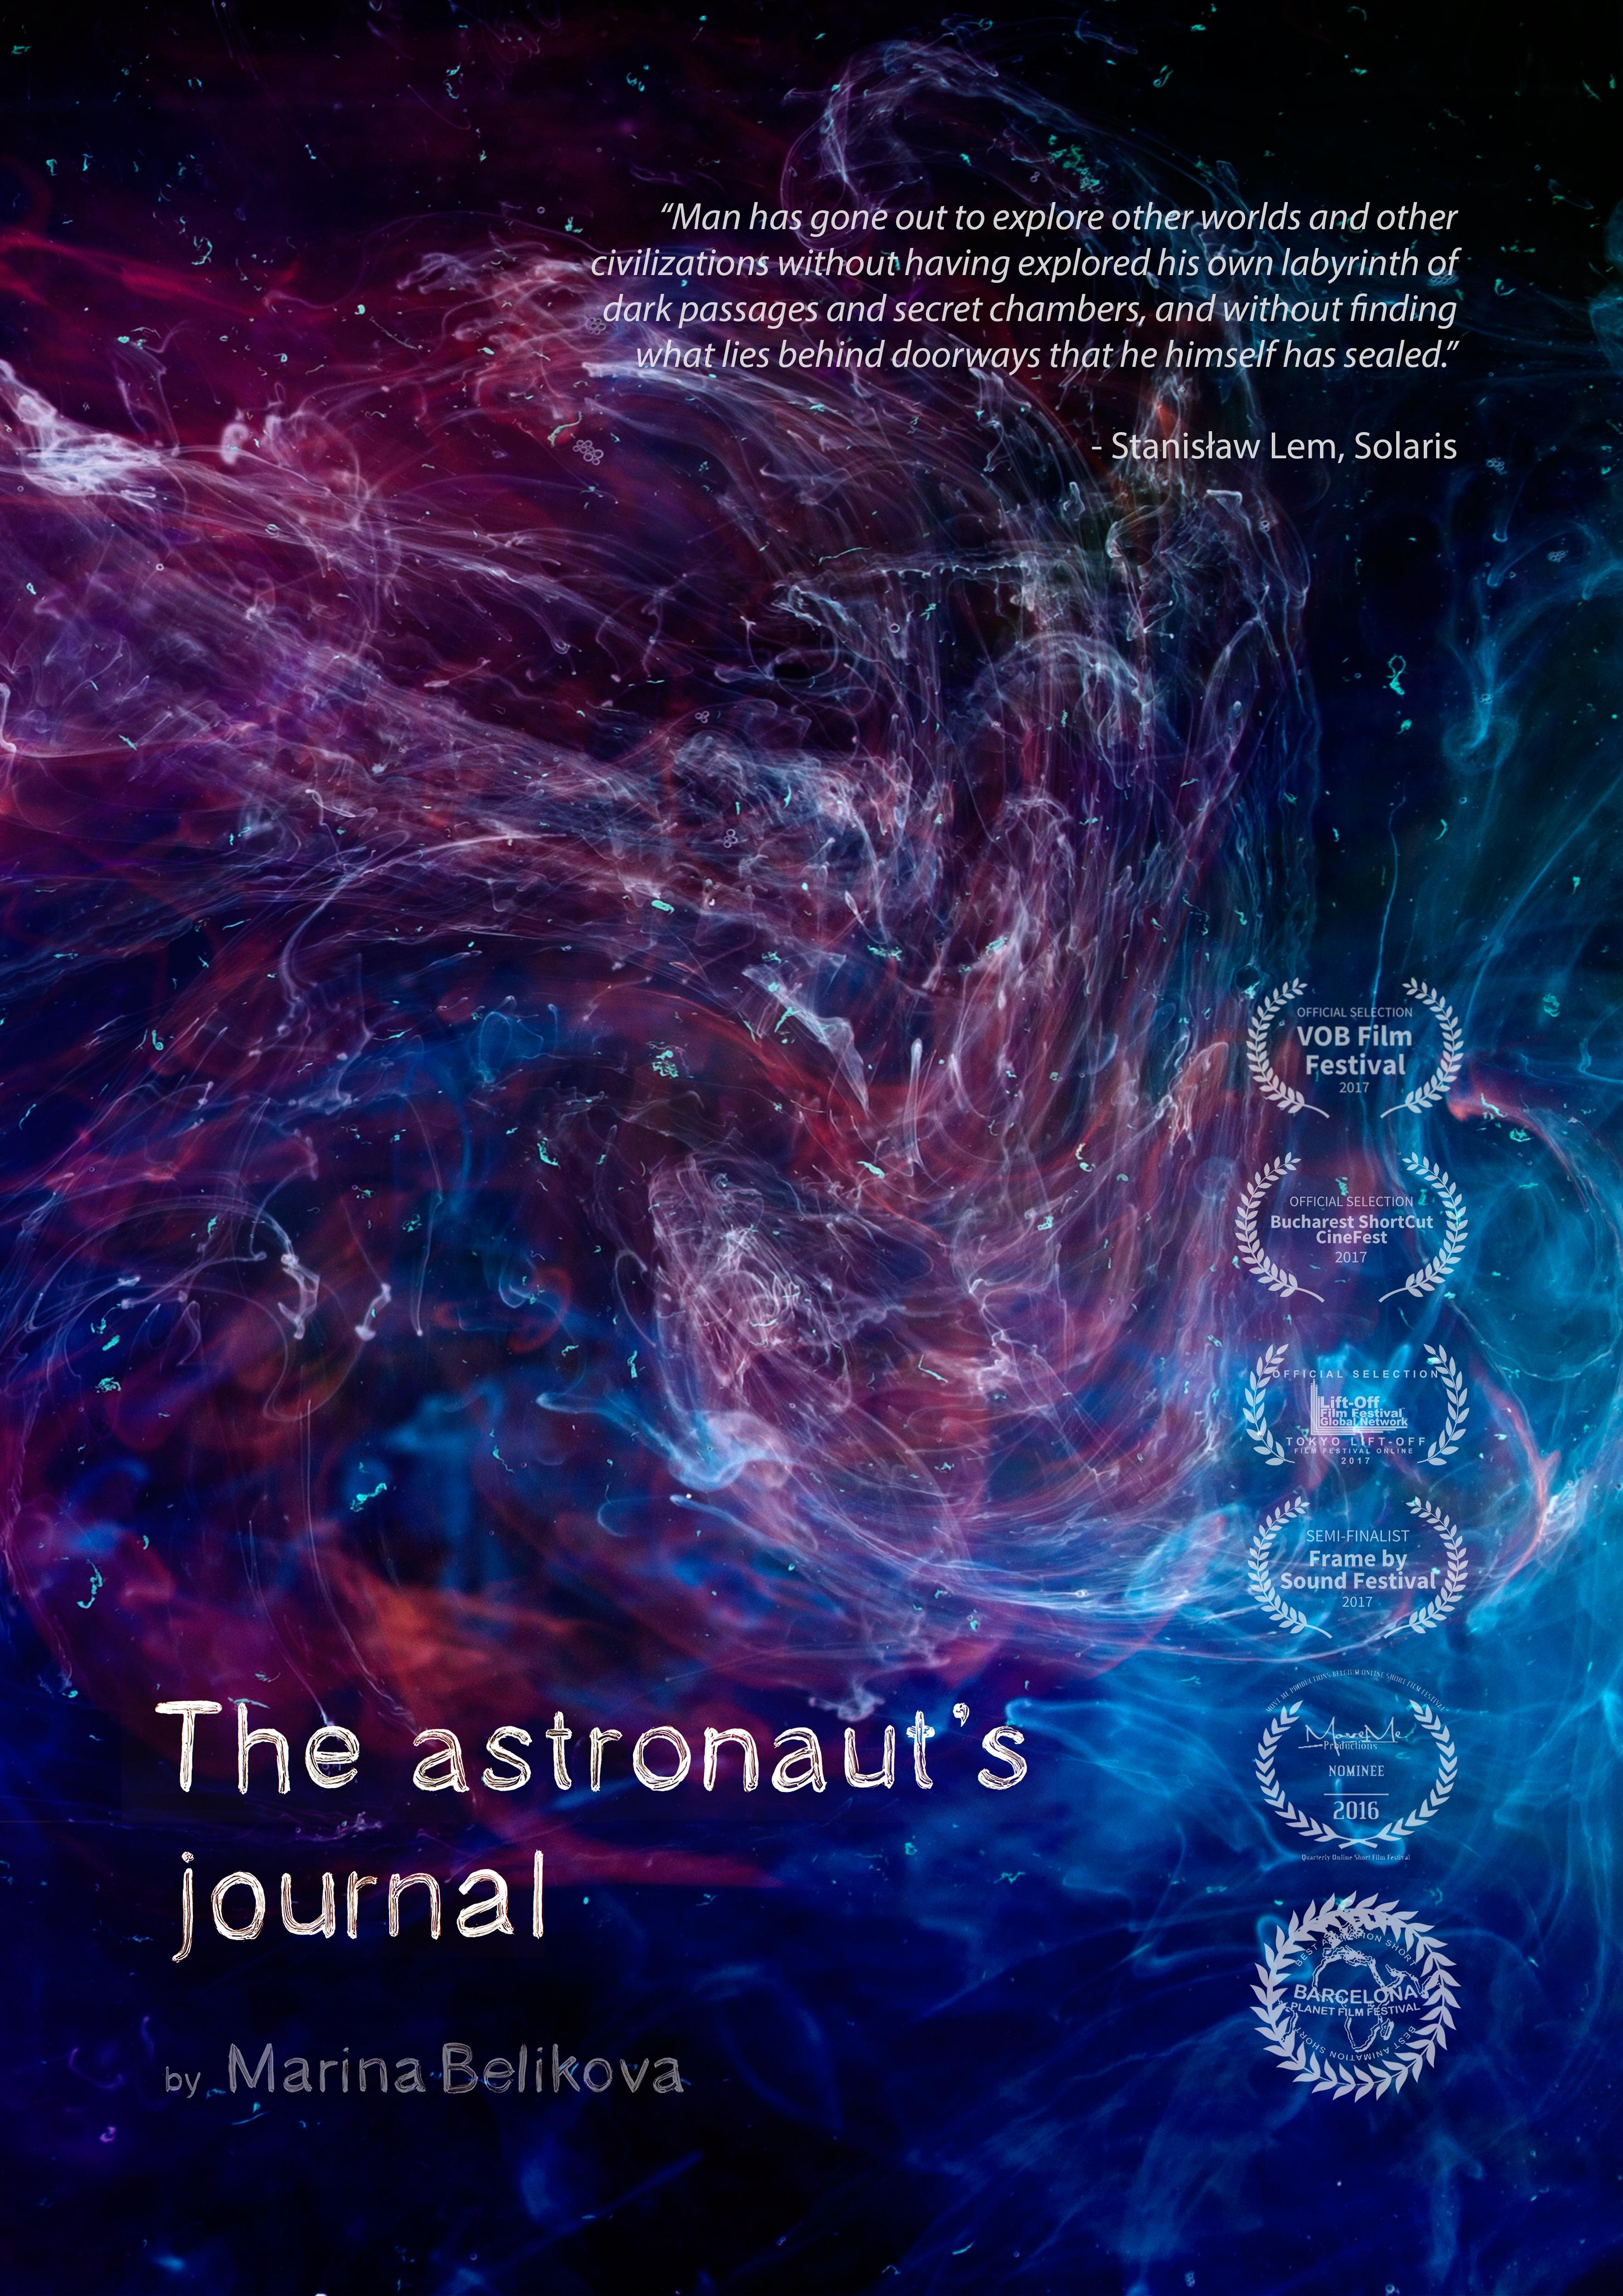 Poster_astronauts_journal_belikova